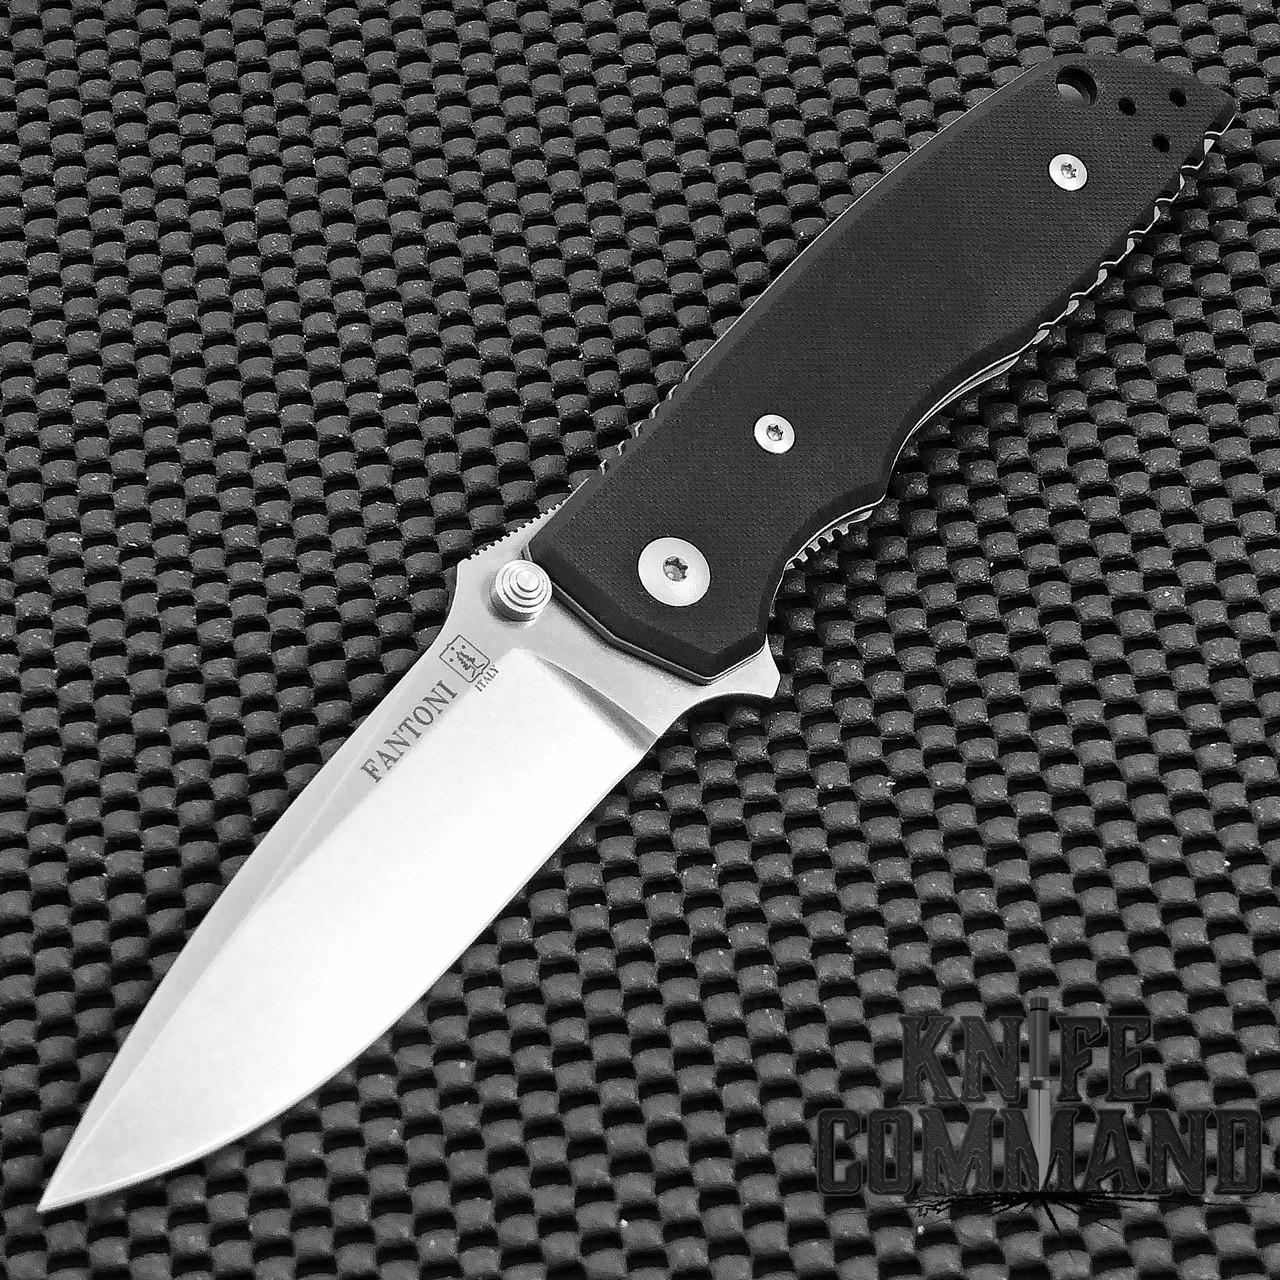 Fantoni HB 01 William Harsey Limited Edition CPM S125V G10 Combat Folder Tactical Knife.  Top of the line.